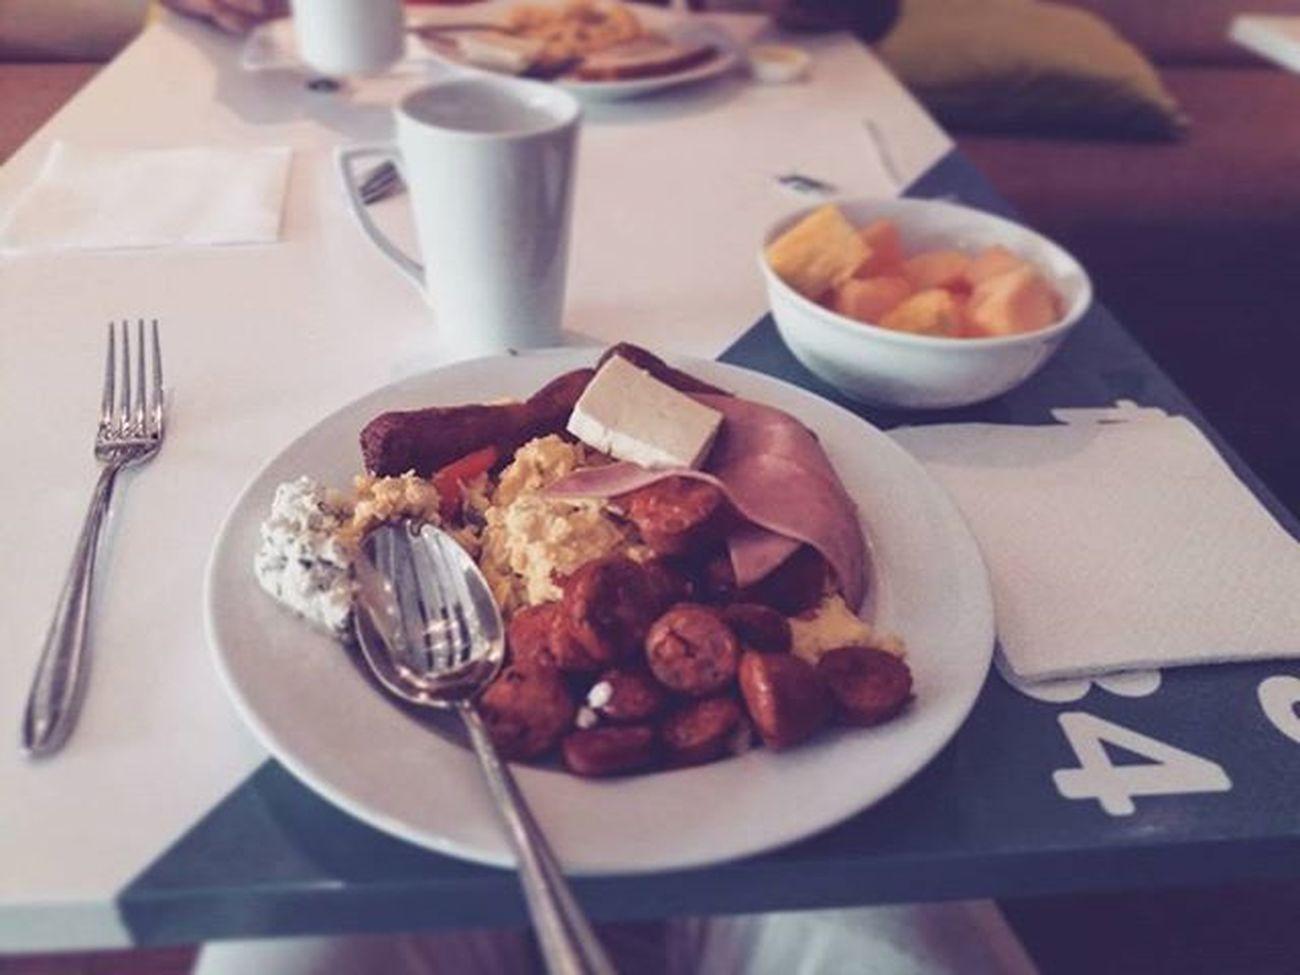 Recargar energias para el primer...🍴🍳☕💯✅🙏🎹shows a romper tarima @soyairboy Thetimehascome TourPromoDondeEstasBquilla Breakfast Like4like Likeforlike Dream Barranquilla Colombia Dios Djs Hotelhampton Artist Hiltonhotel Breakfastofchampions